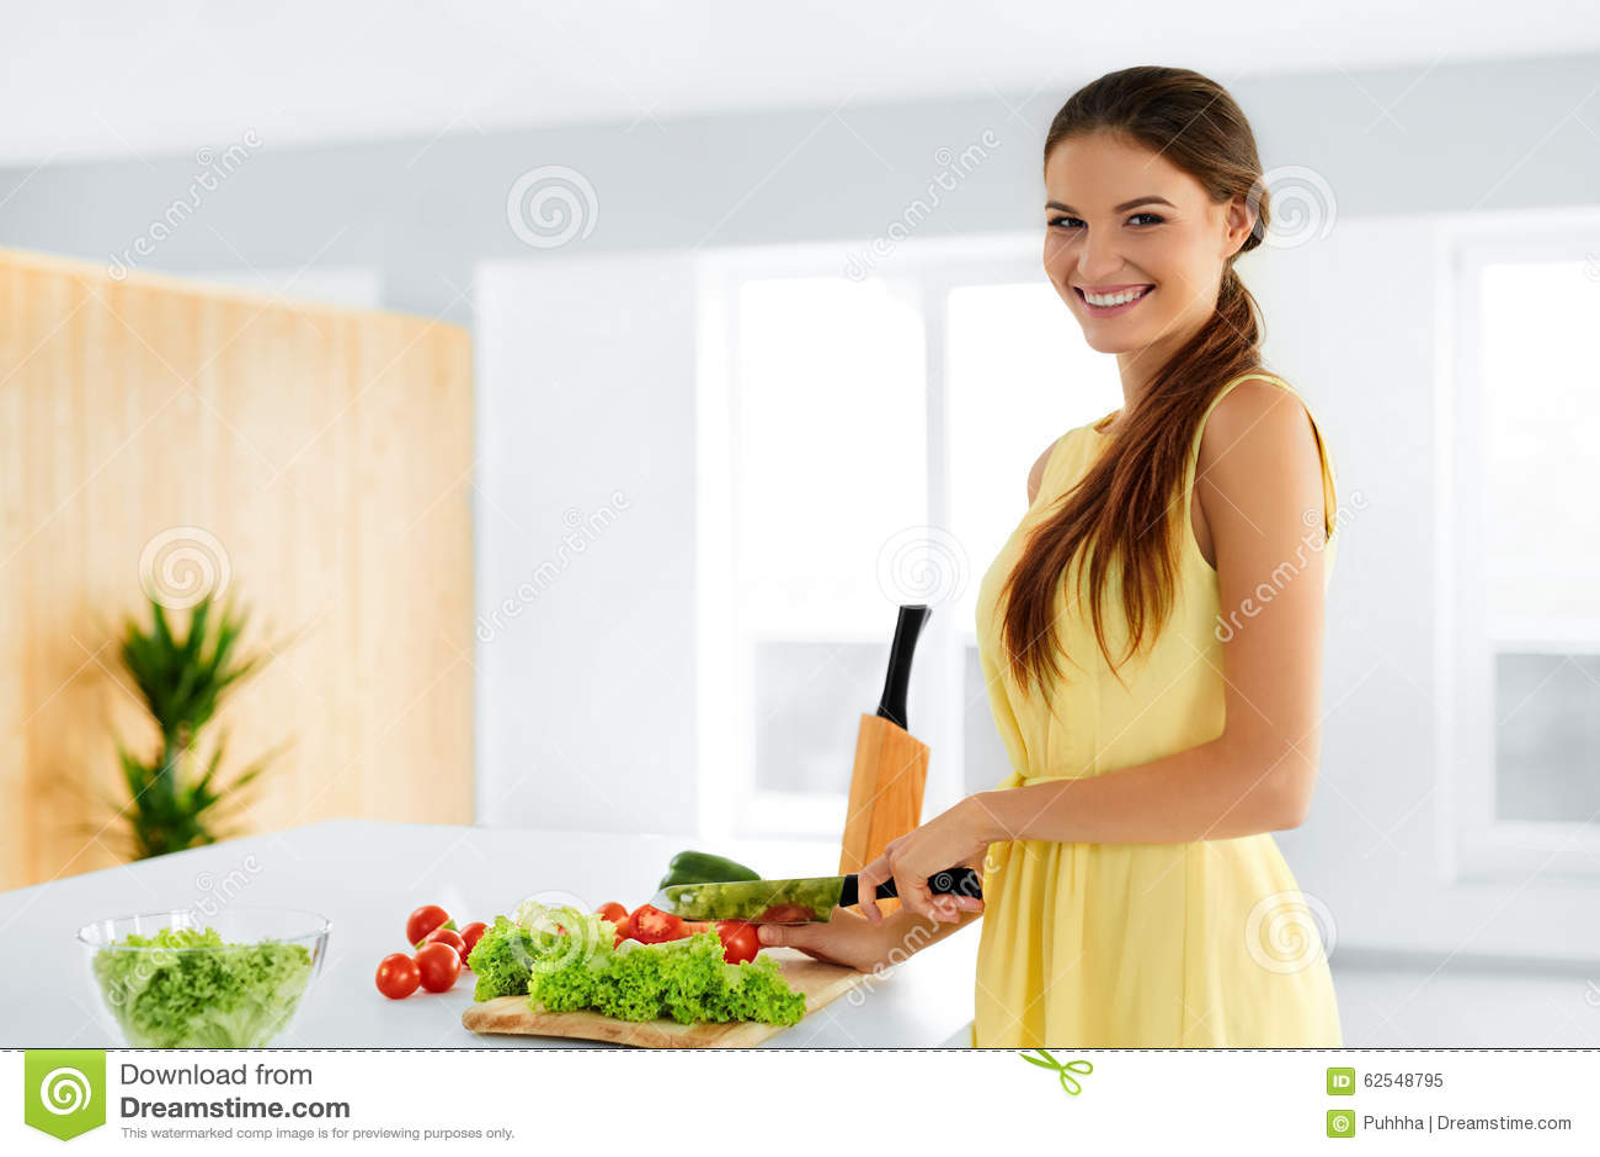 Diet. Healthy Eating Woman Cooking Organic Food. Lifestyle. Prep